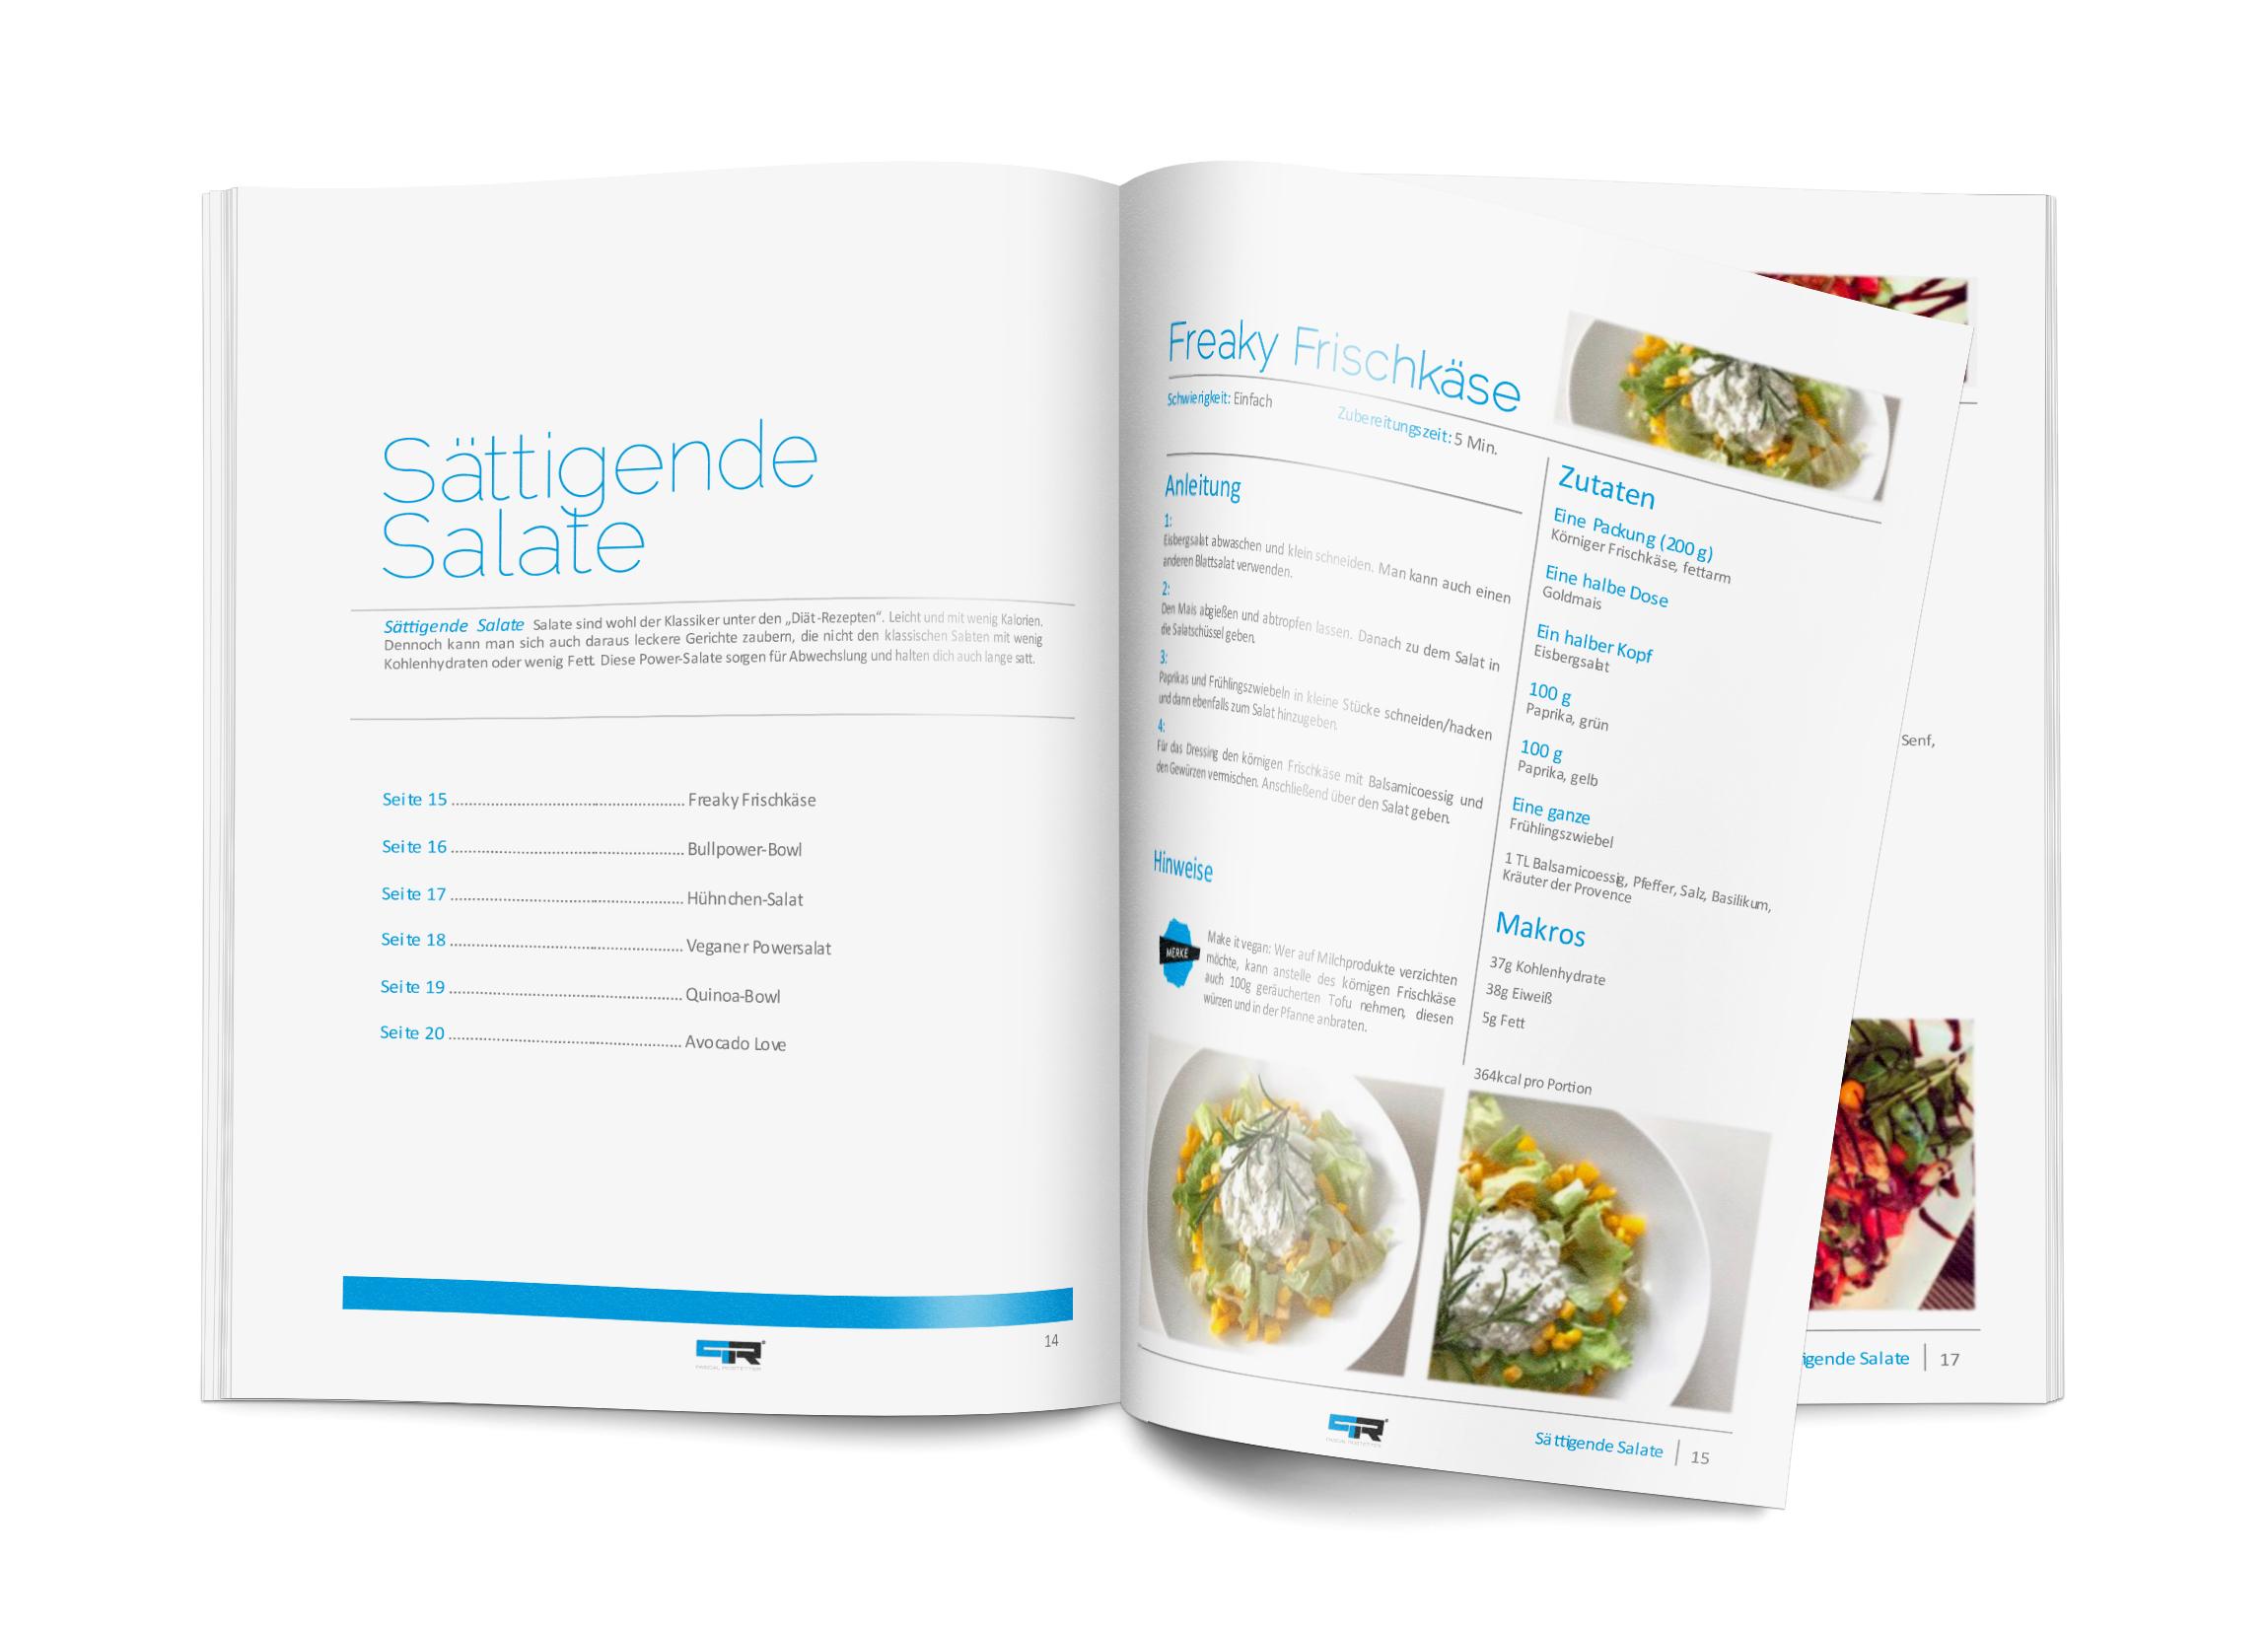 abnehmen ohne hungern das rezeptbuch ebook pdf fit mit pascal. Black Bedroom Furniture Sets. Home Design Ideas